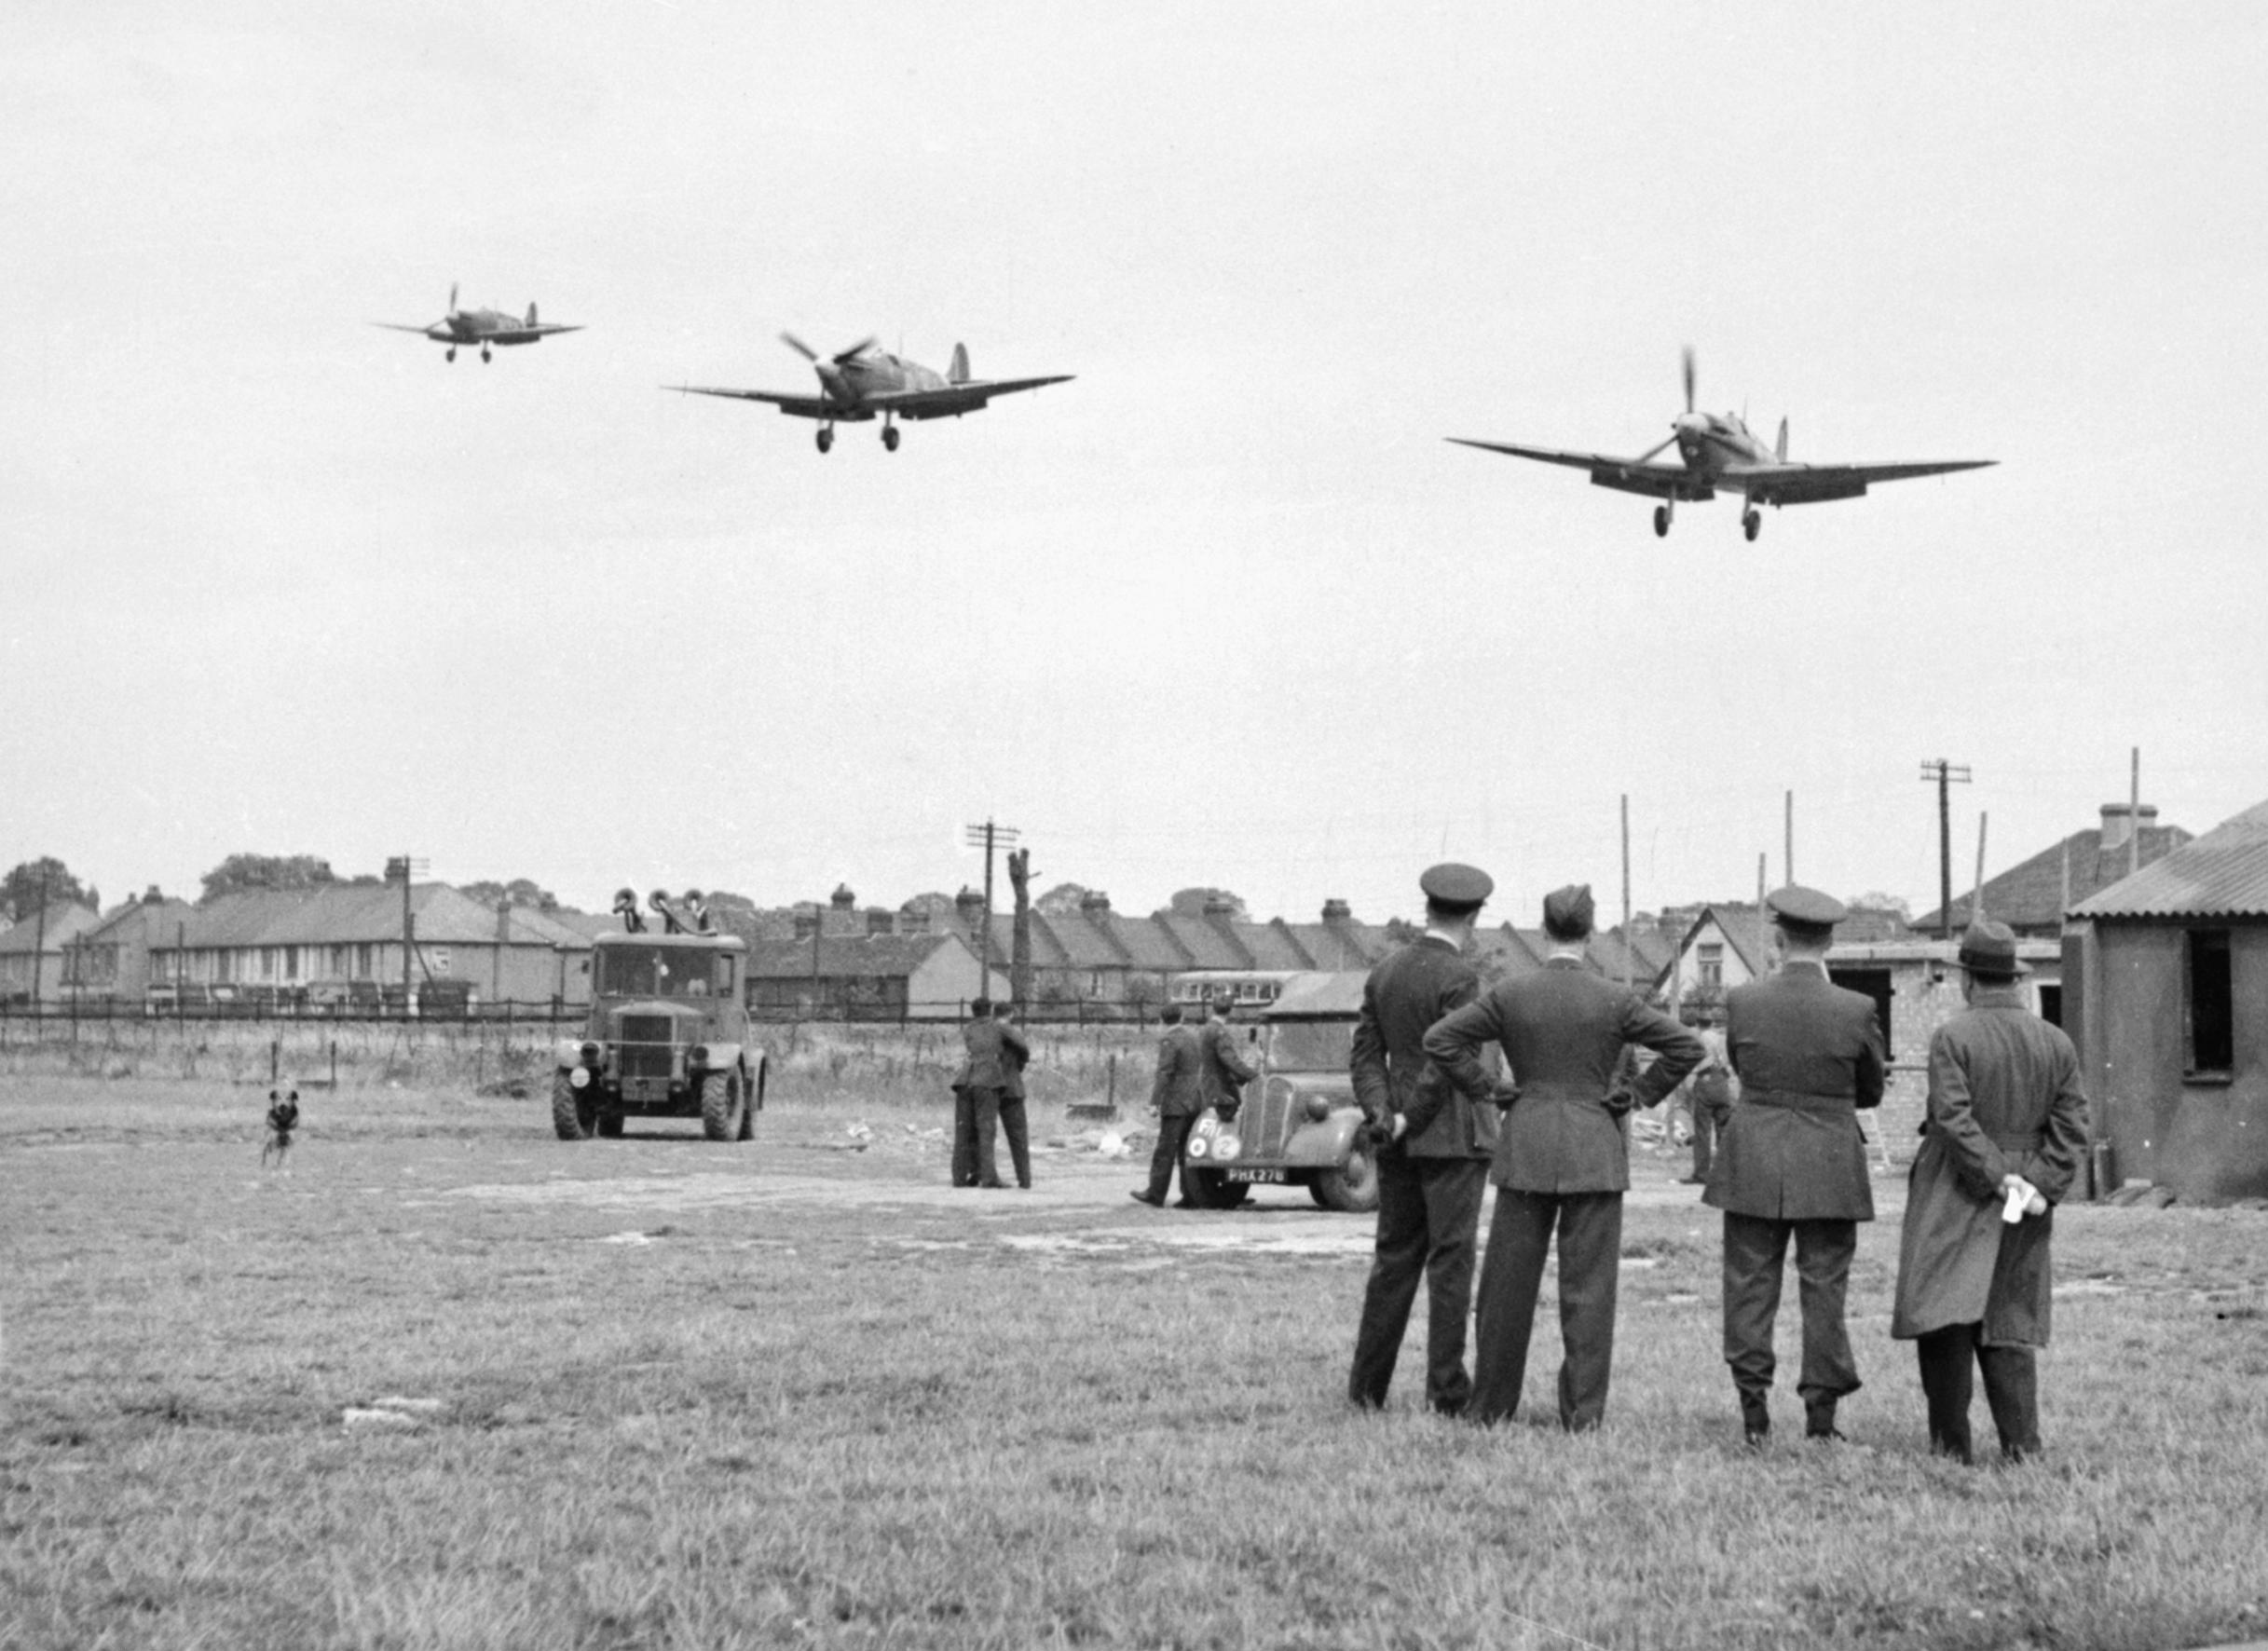 No. 121 Squadron RAF